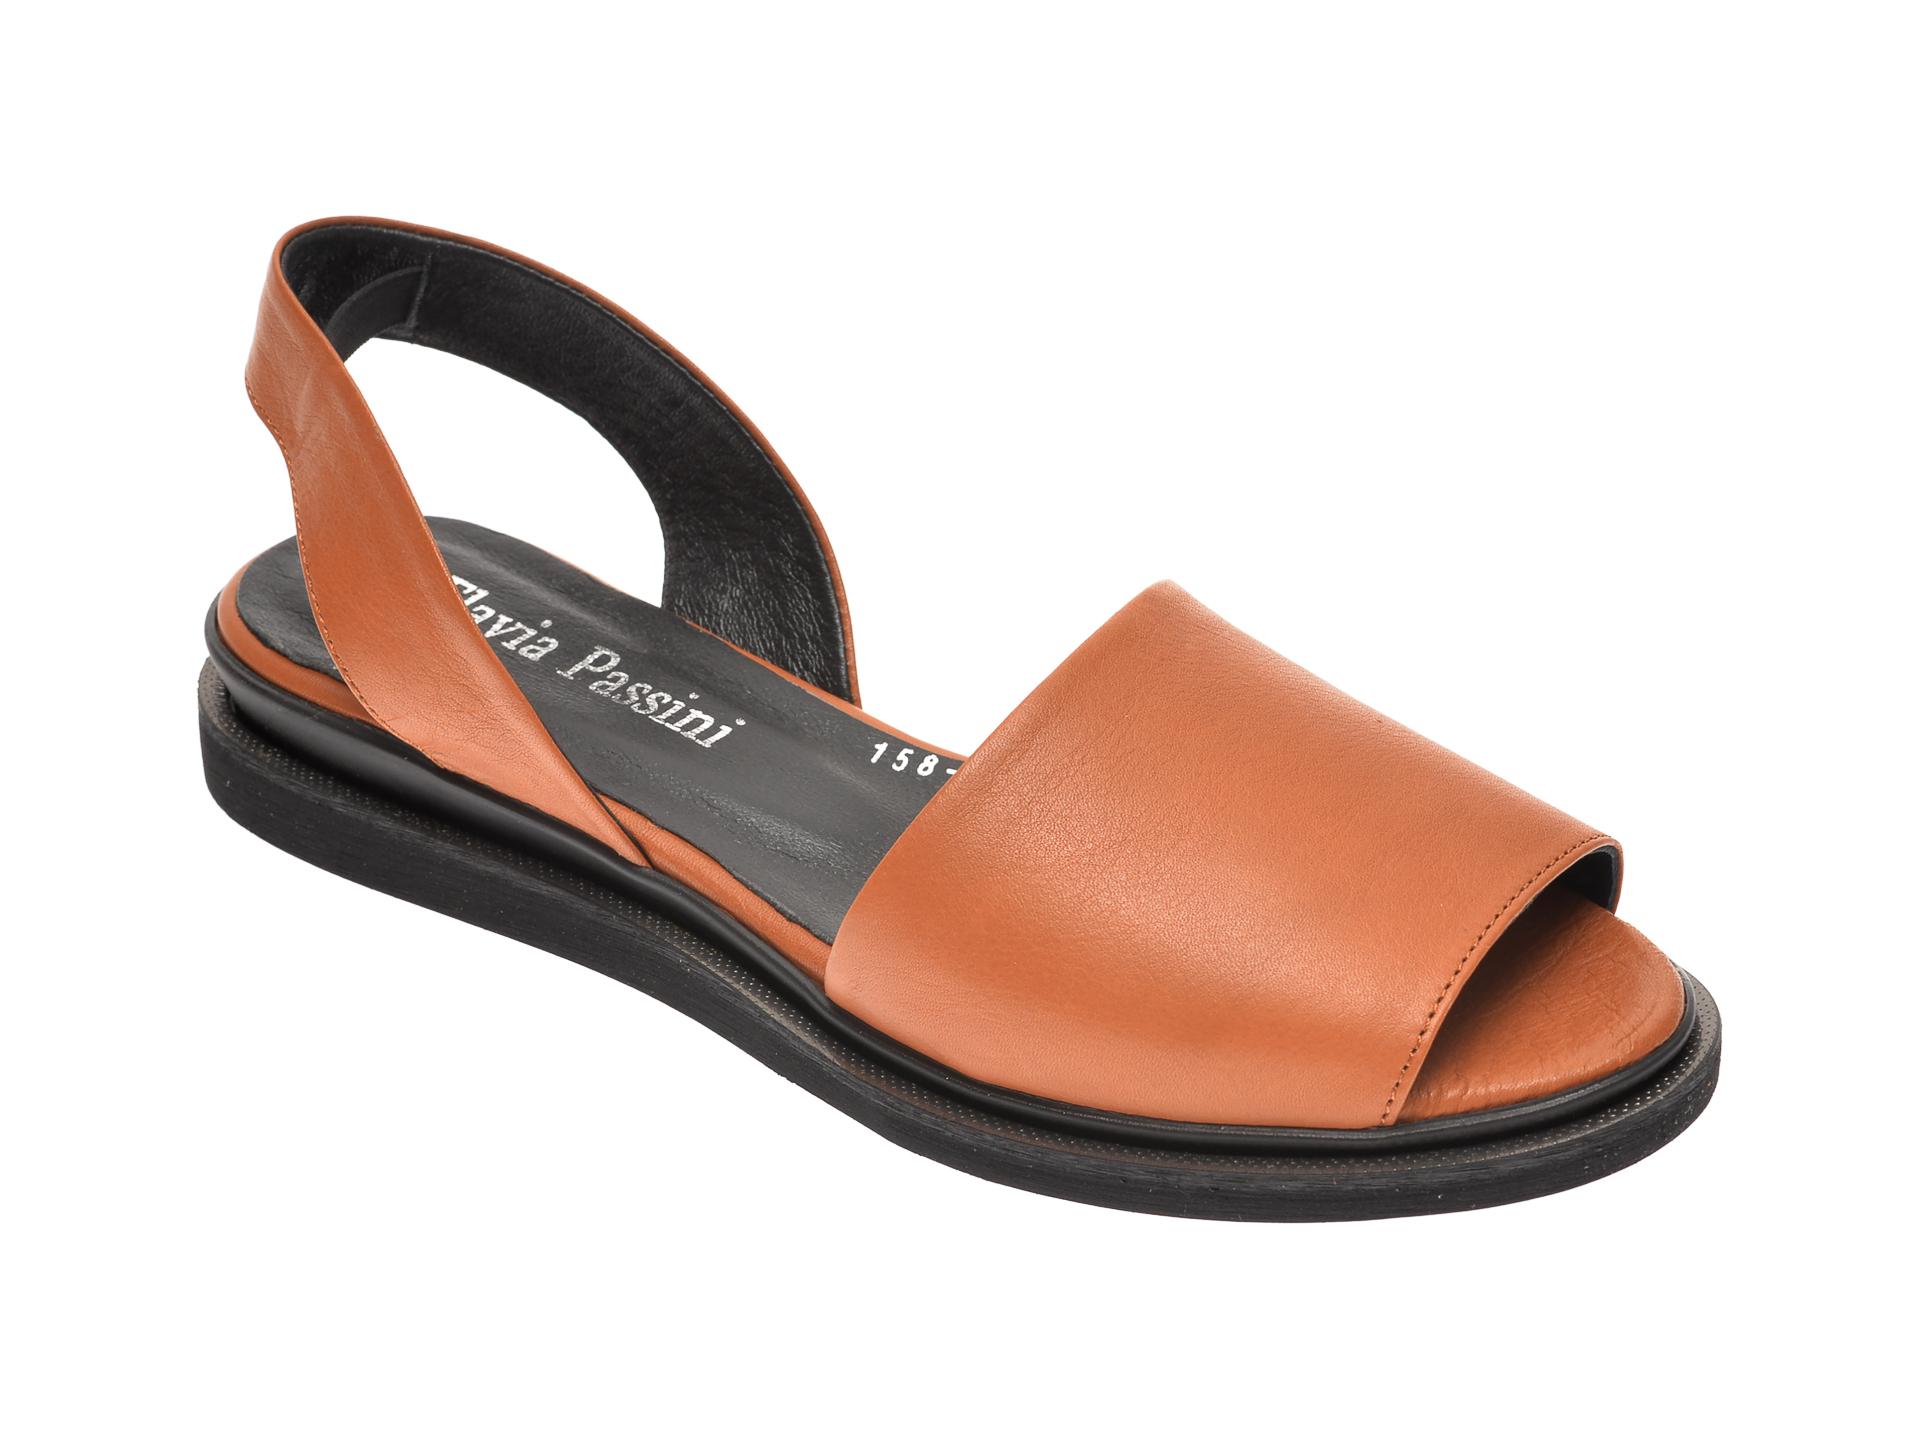 Sandale FLAVIA PASSINI maro, 1581051, din piele naturala New